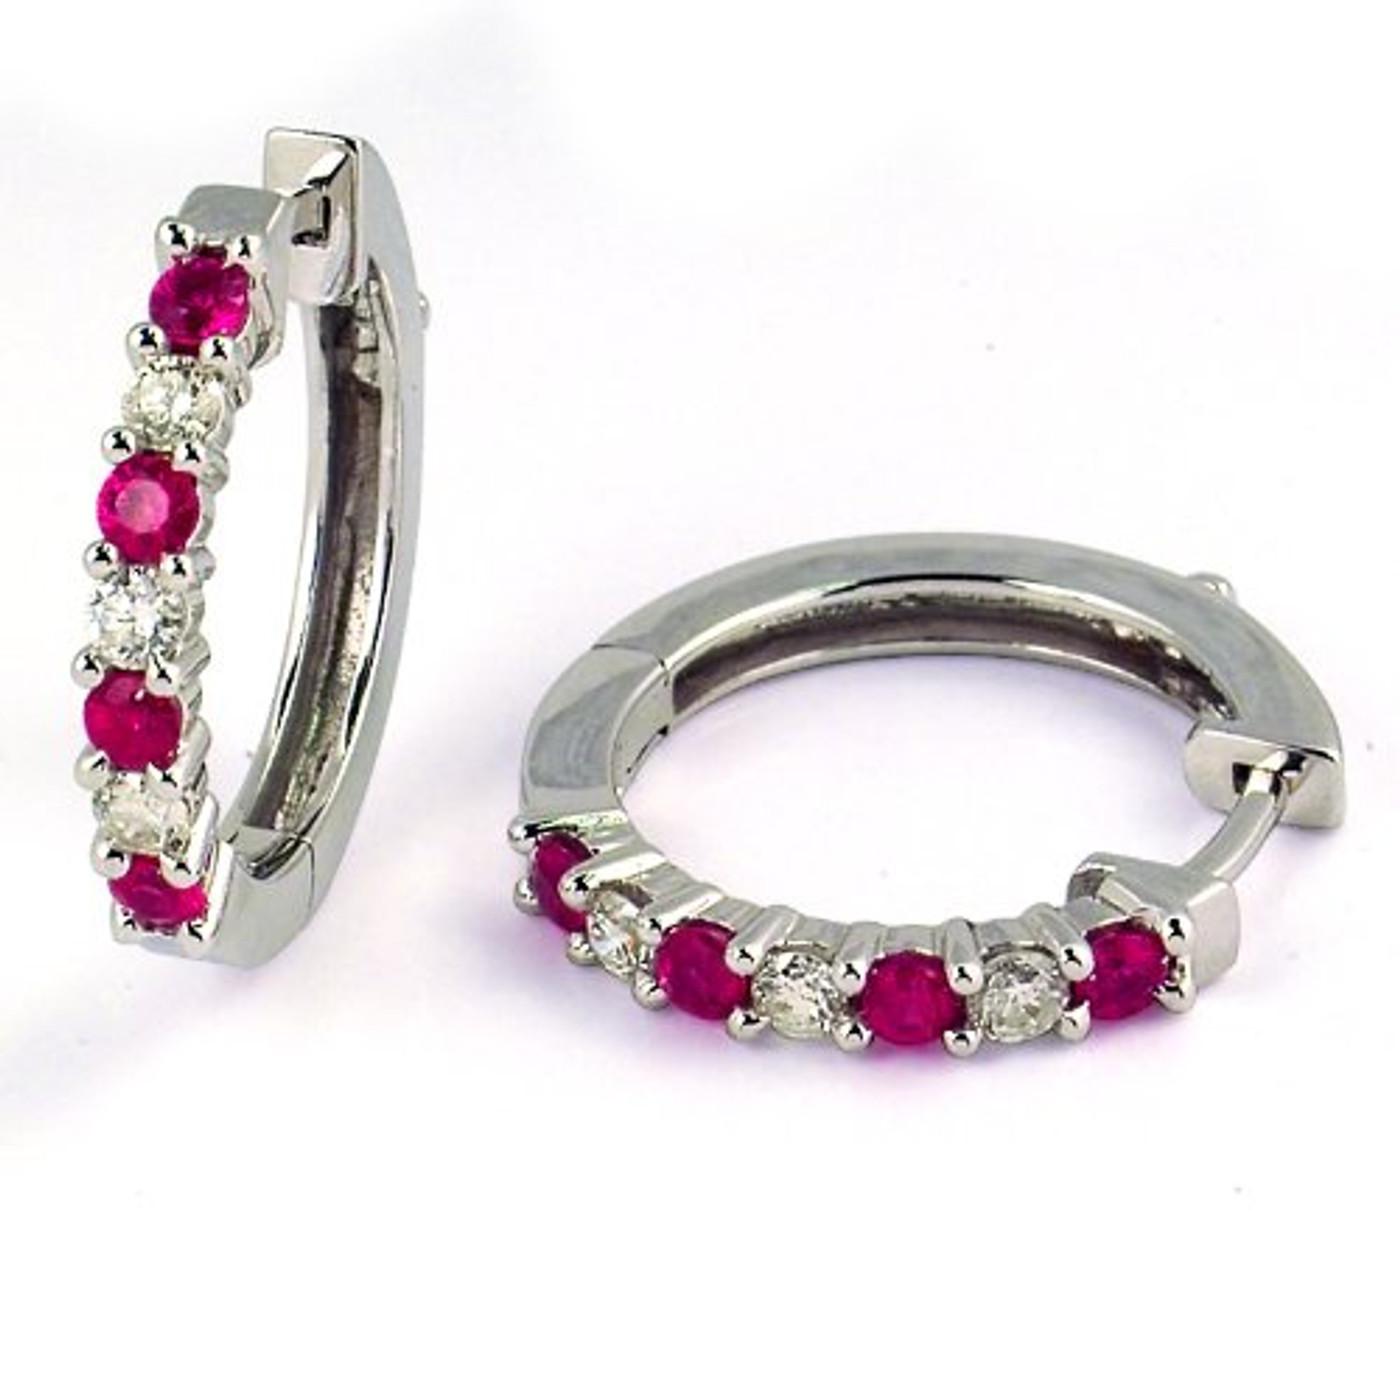 14 Karat White Gold Diamond & Ruby .35 DTW Hoop Earrings